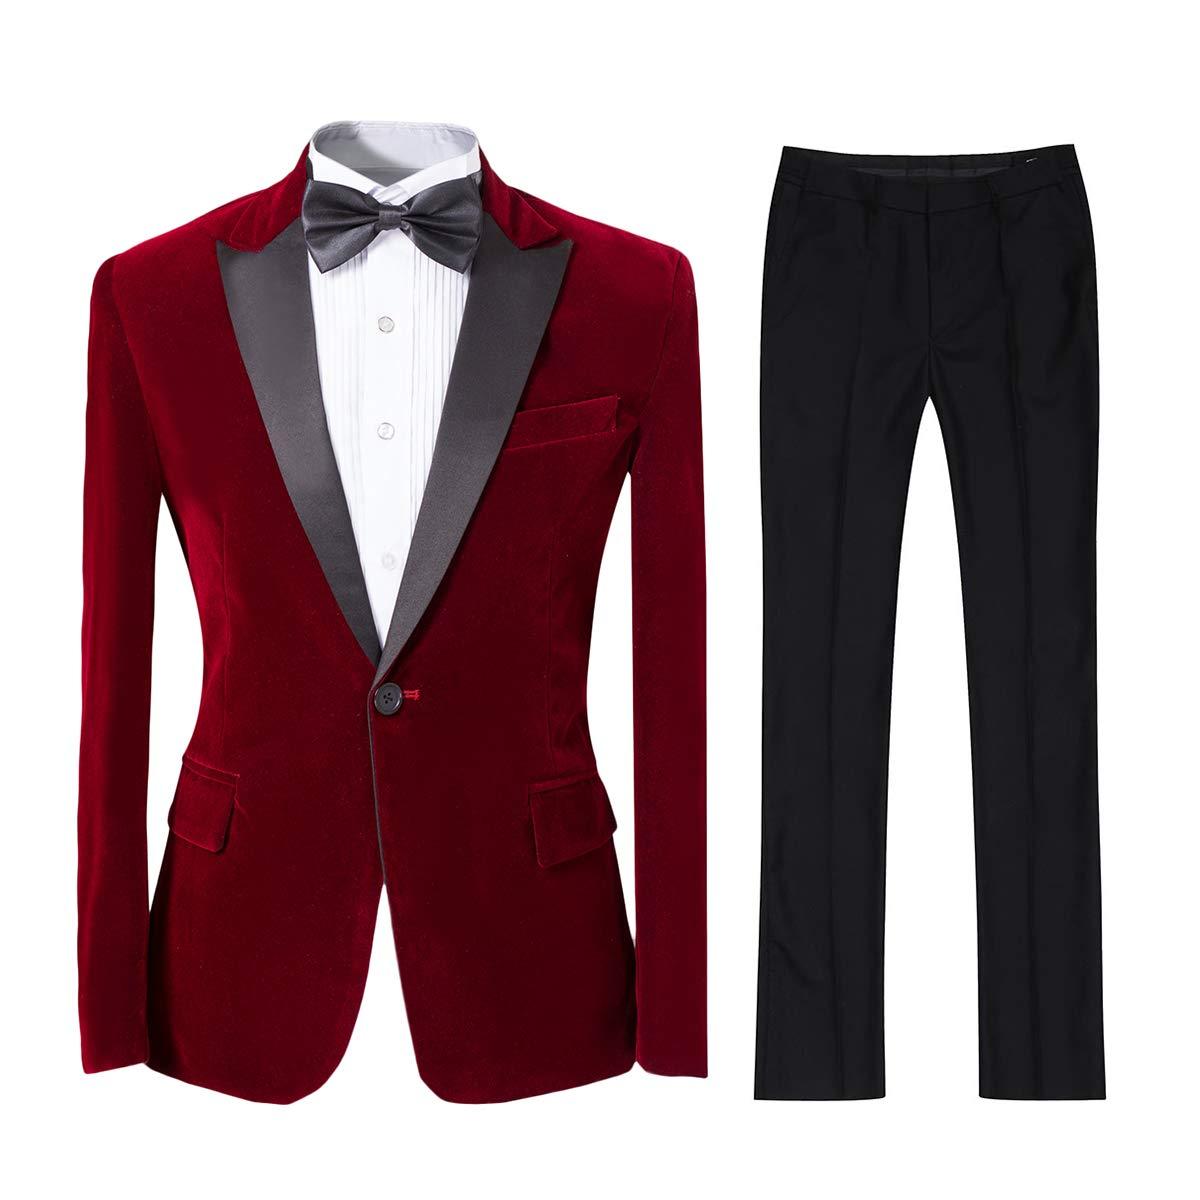 Mens 2-piece Suit Peaked Lapel One Button Tuxedo Slim Fit Dinner Jacket & Pants, Red, Medium